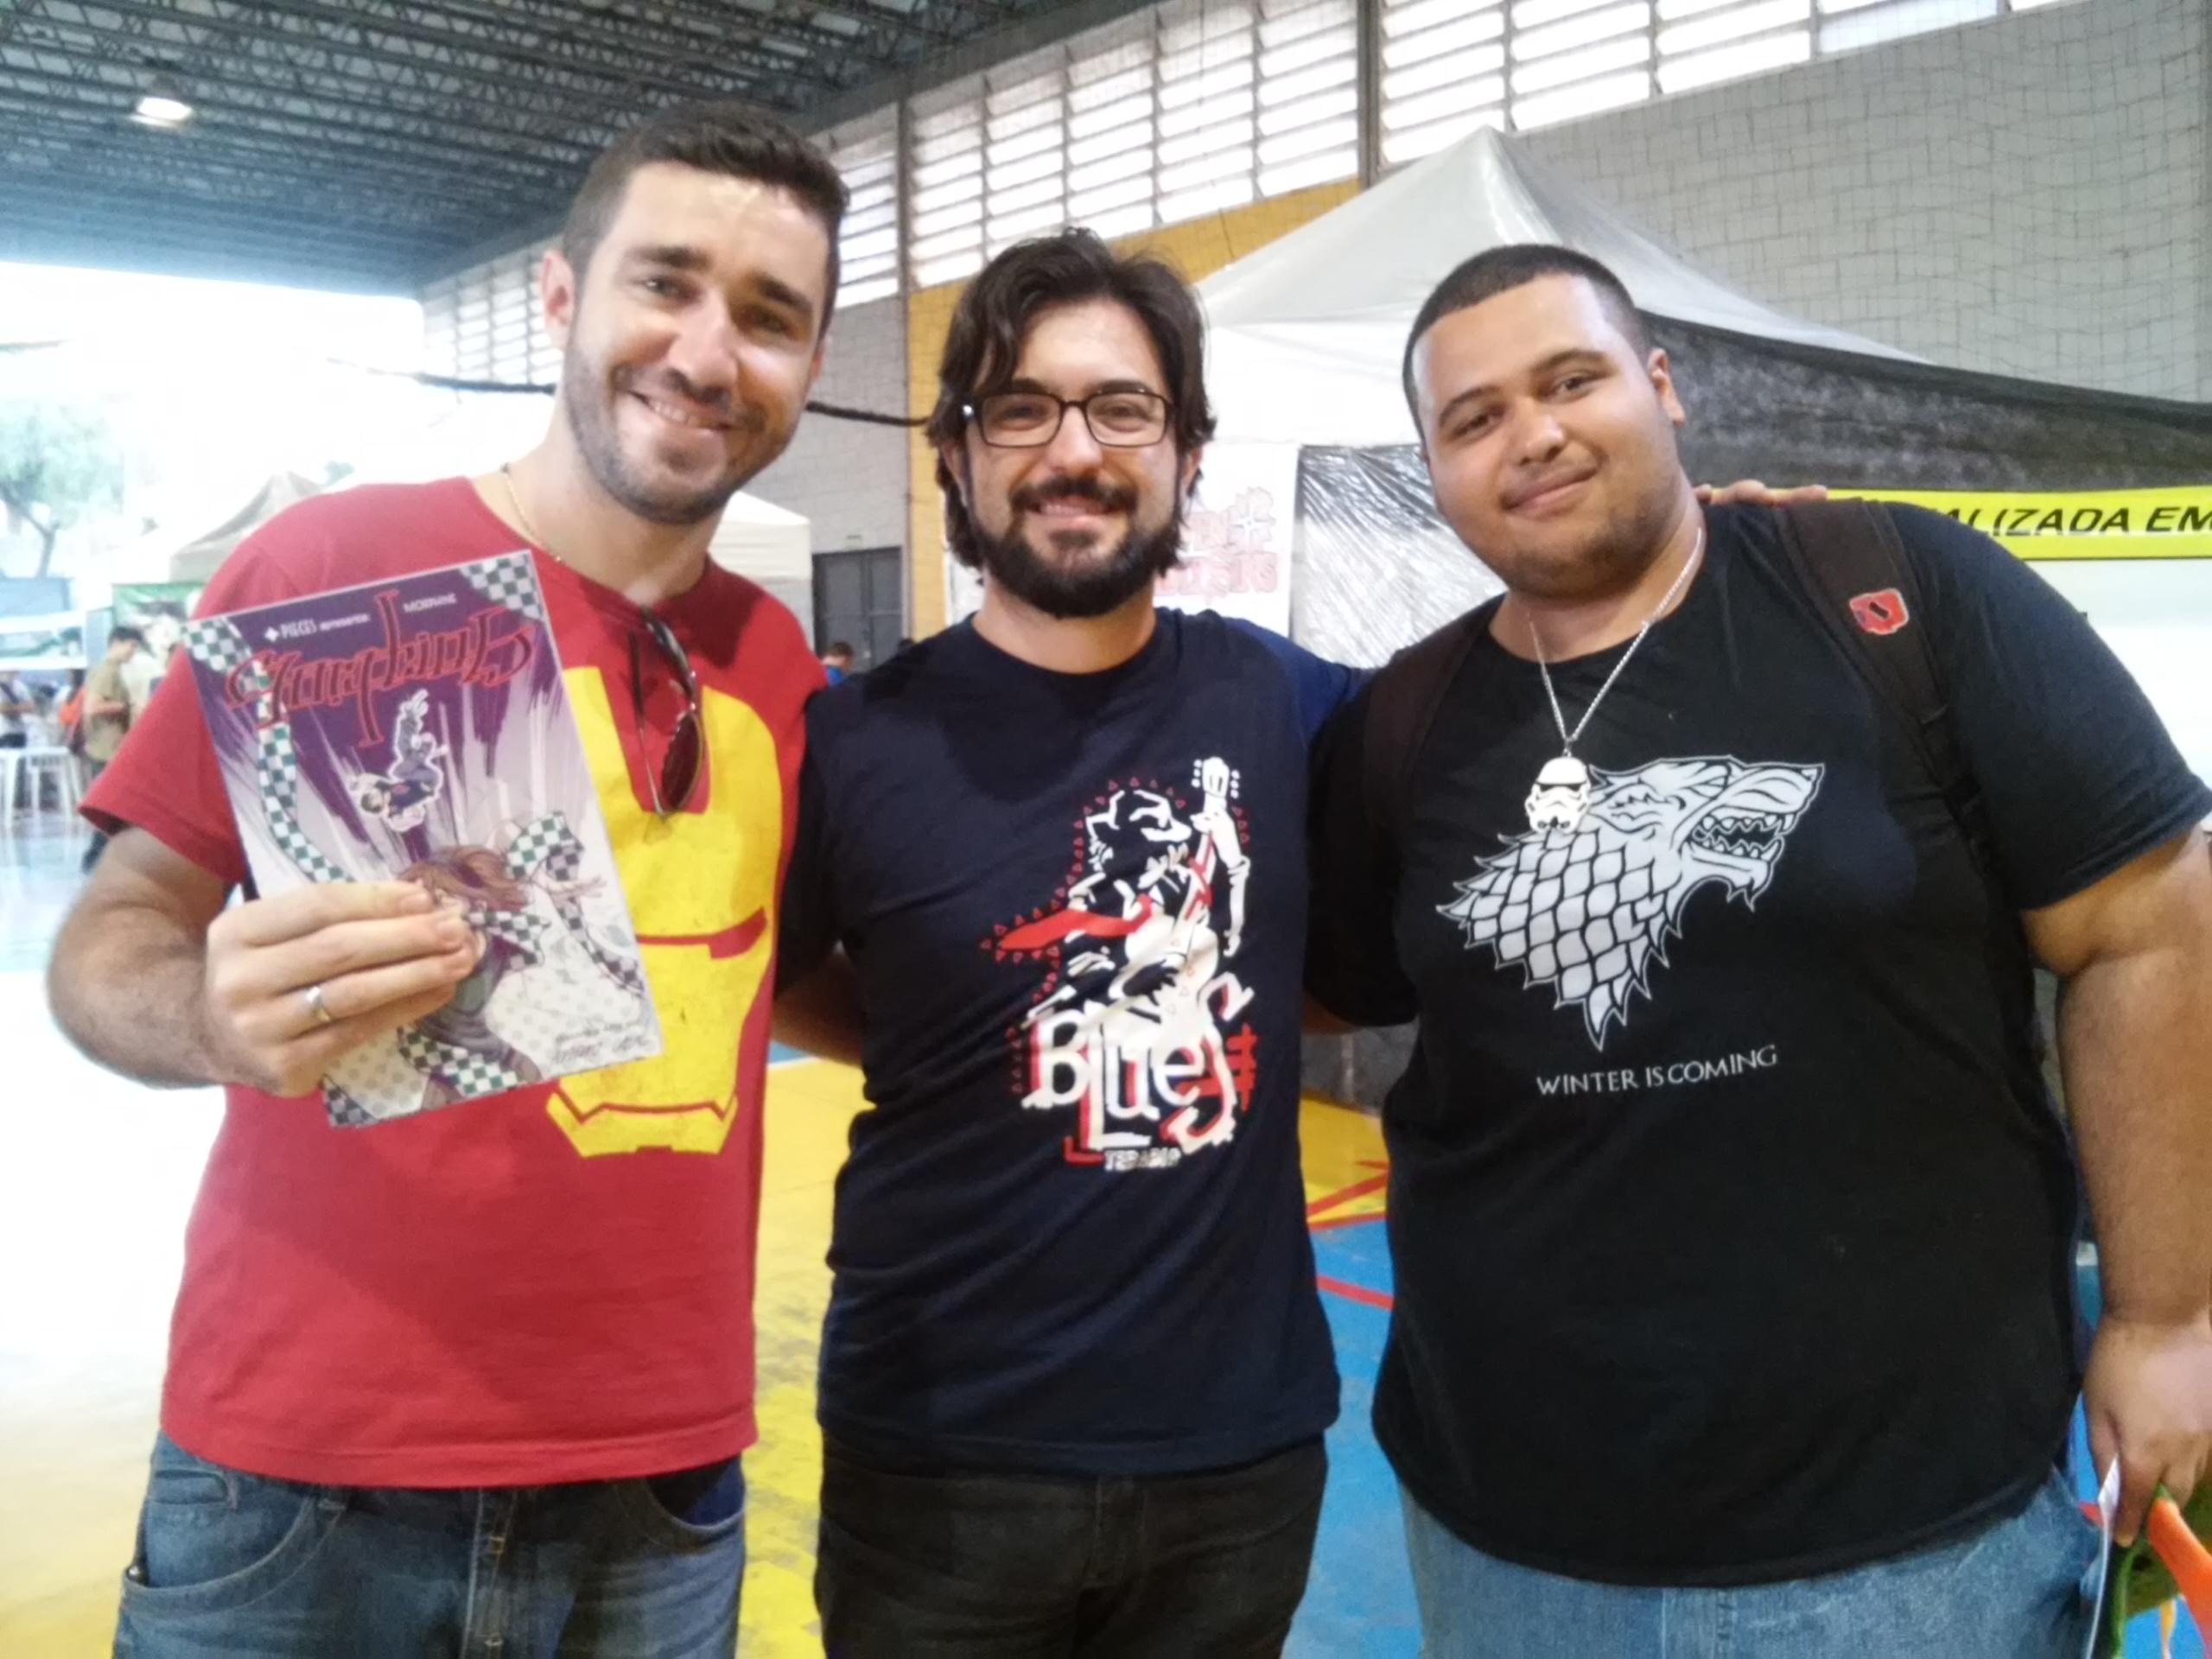 Da esquerda para a direita: Eu (Márcio), Mario Cau, e o meu amigo Robson Stark